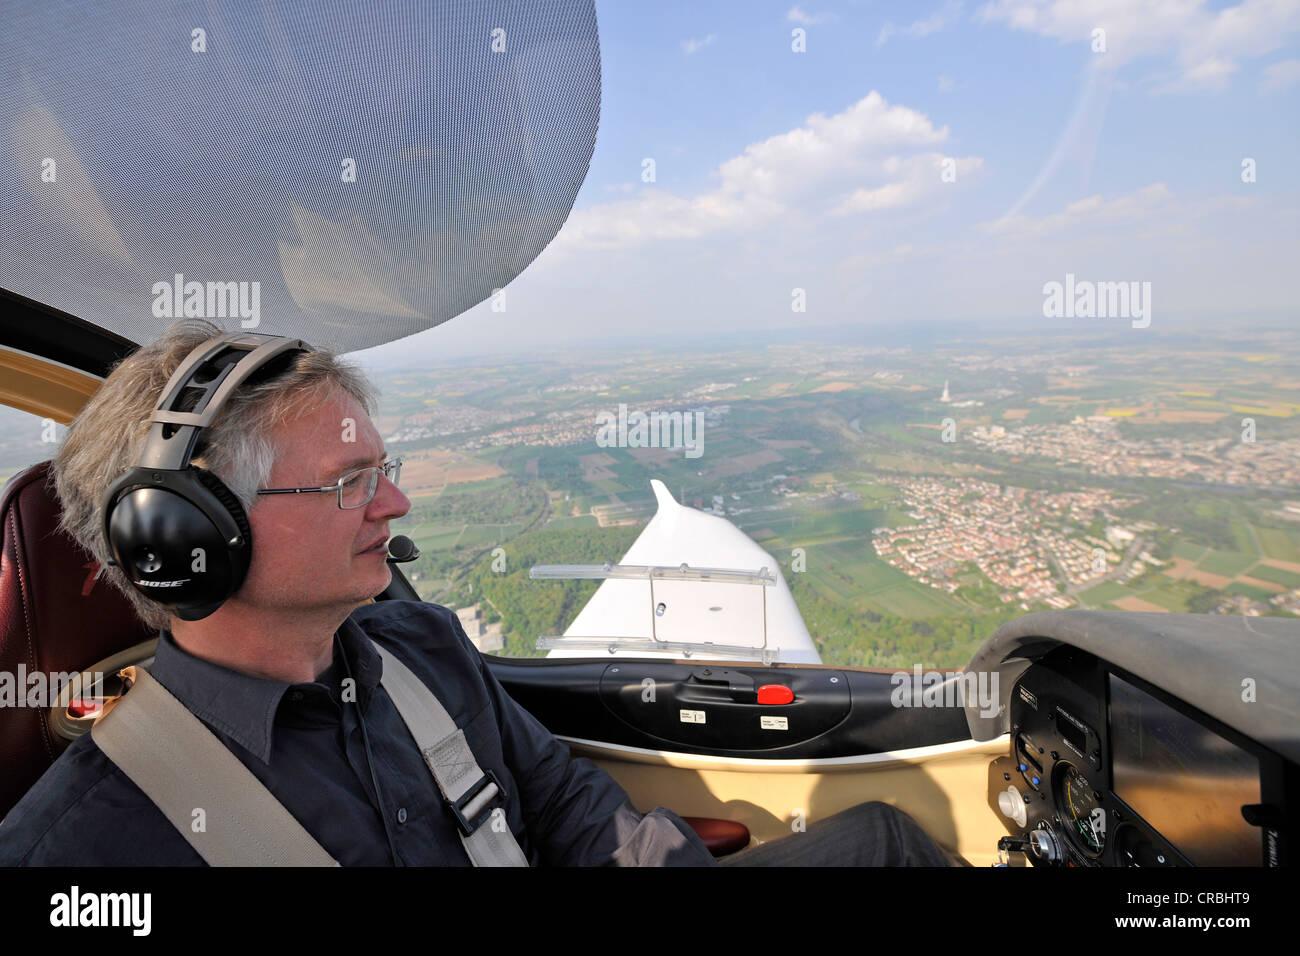 Pilot, glass cockpit light aircraft, D-ESOA Aquila A210 AT01 - Stock Image